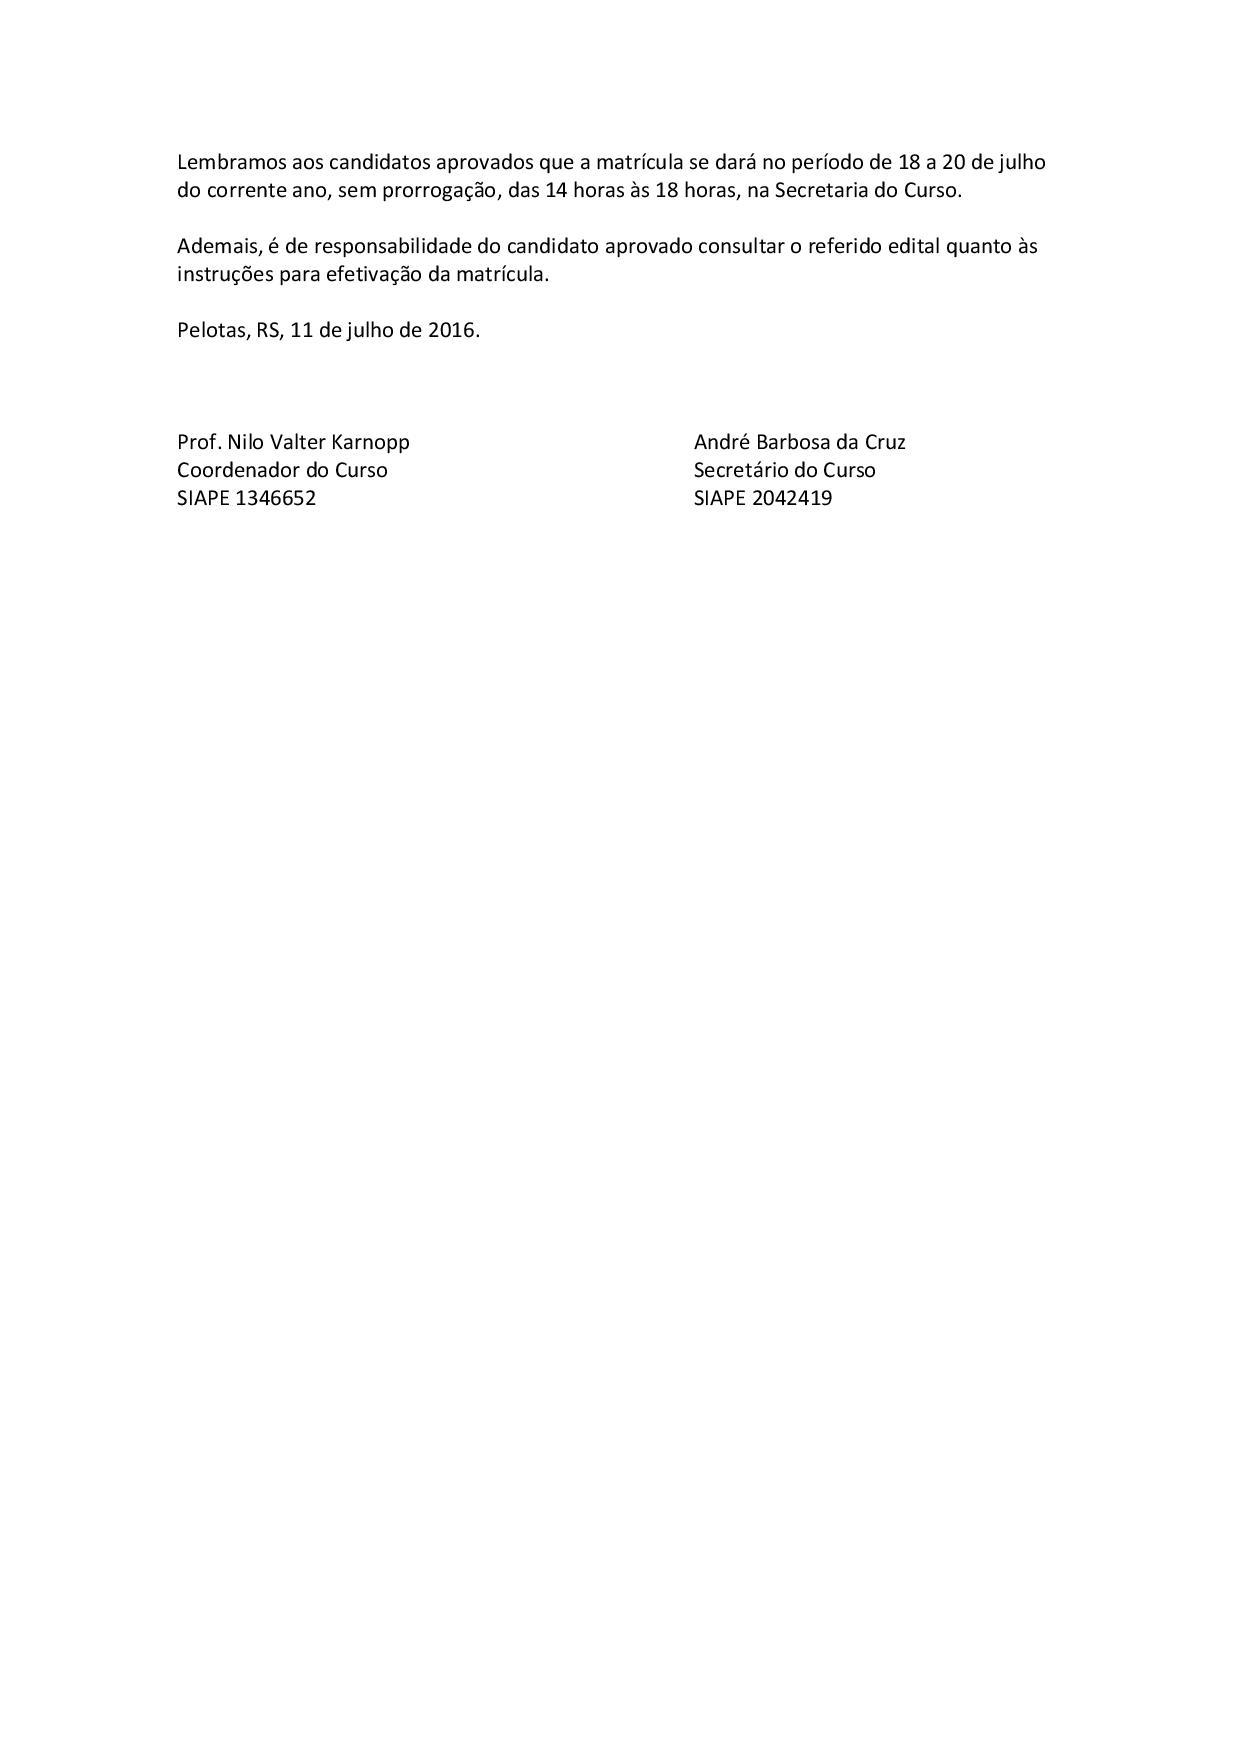 Comunicado sobre candidatos aprovados-page-002